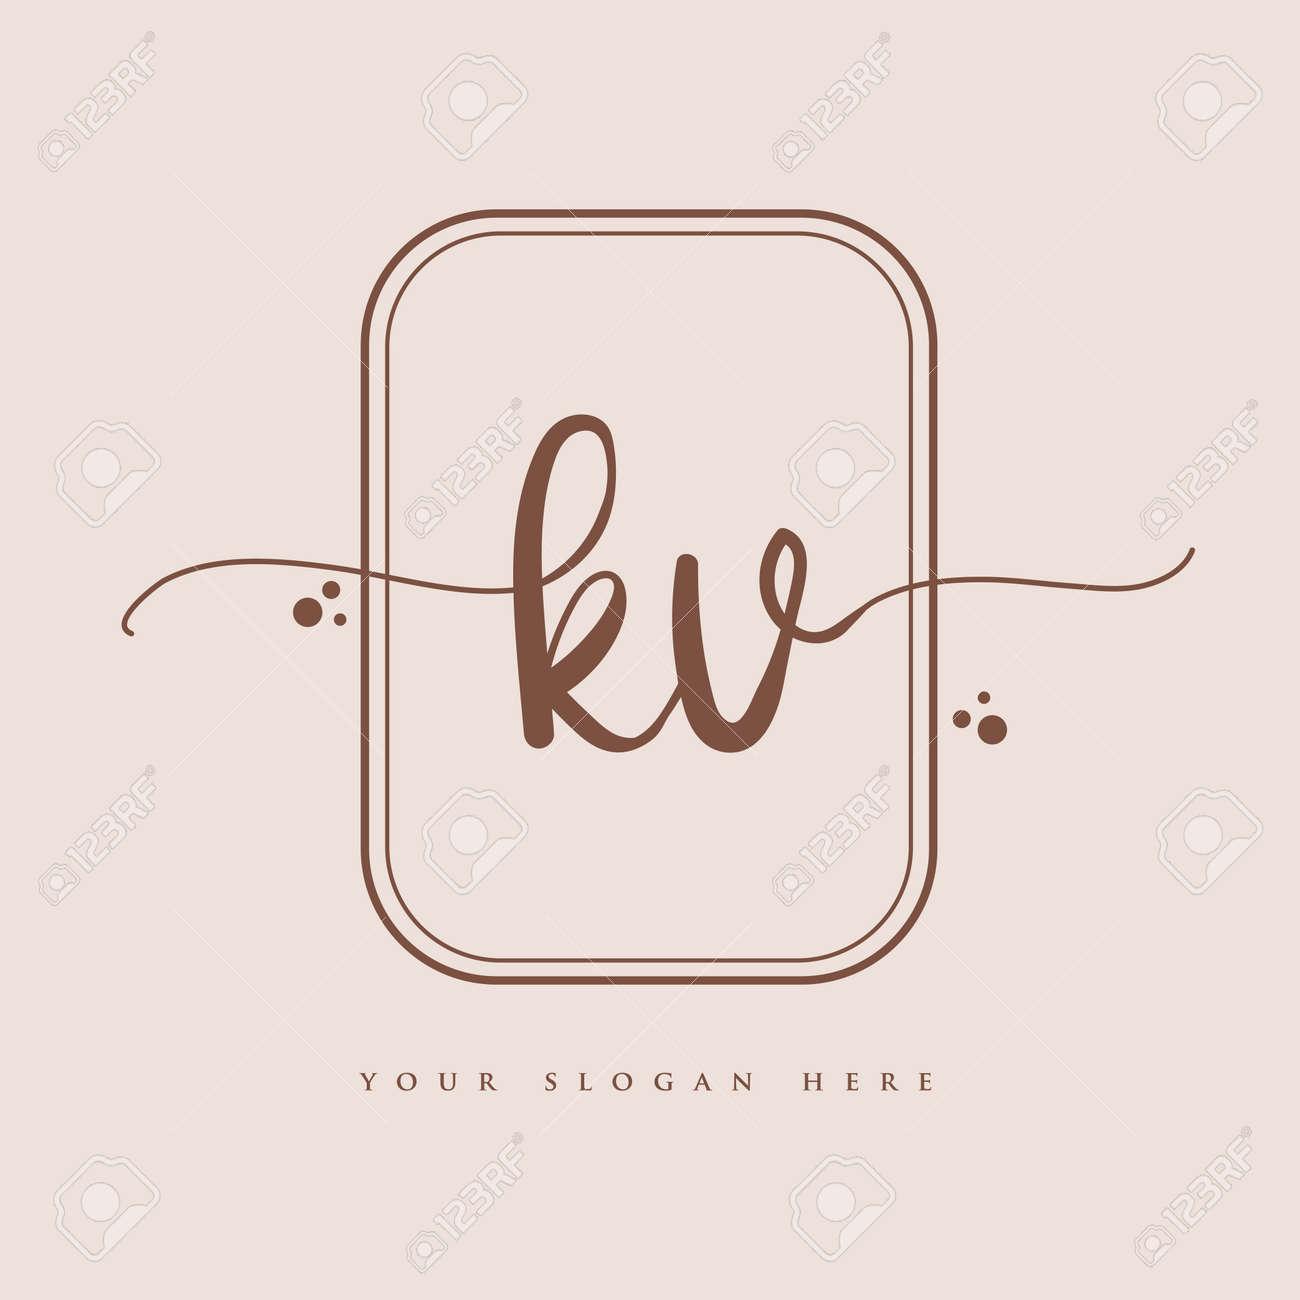 KV Initial handwriting logo. Hand lettering Initials logo branding, Feminine and luxury logo design isolated on elegant background. - 163287312